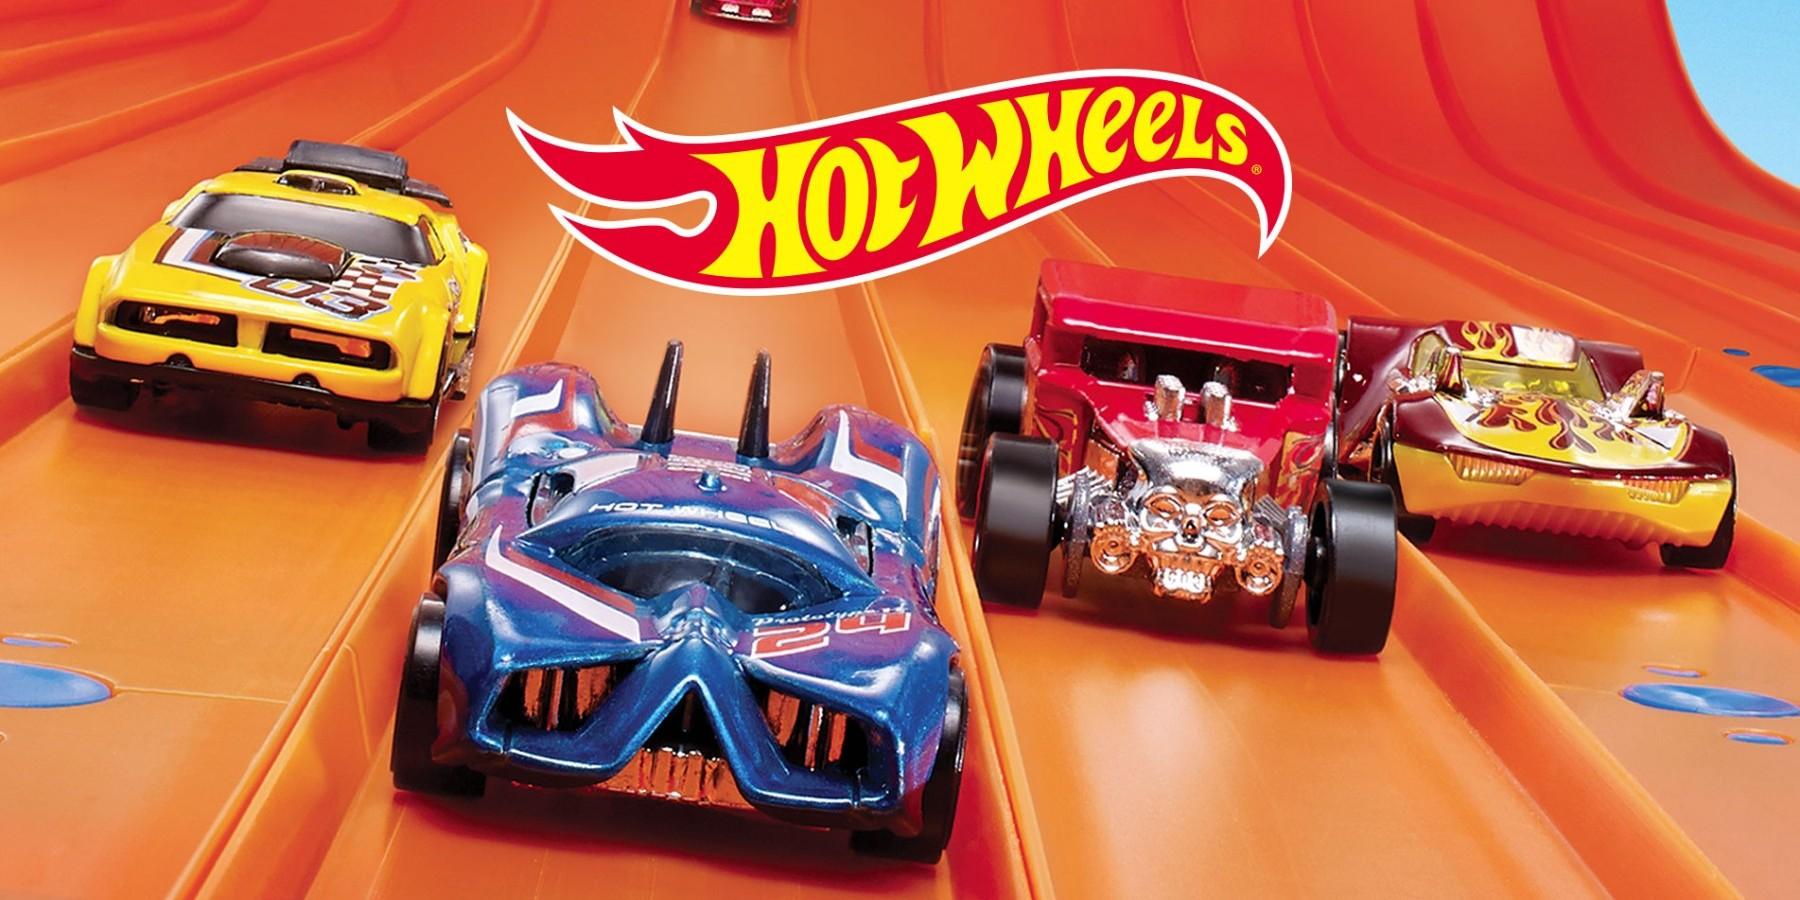 Hot-Wheels-e1475097900942.jpg